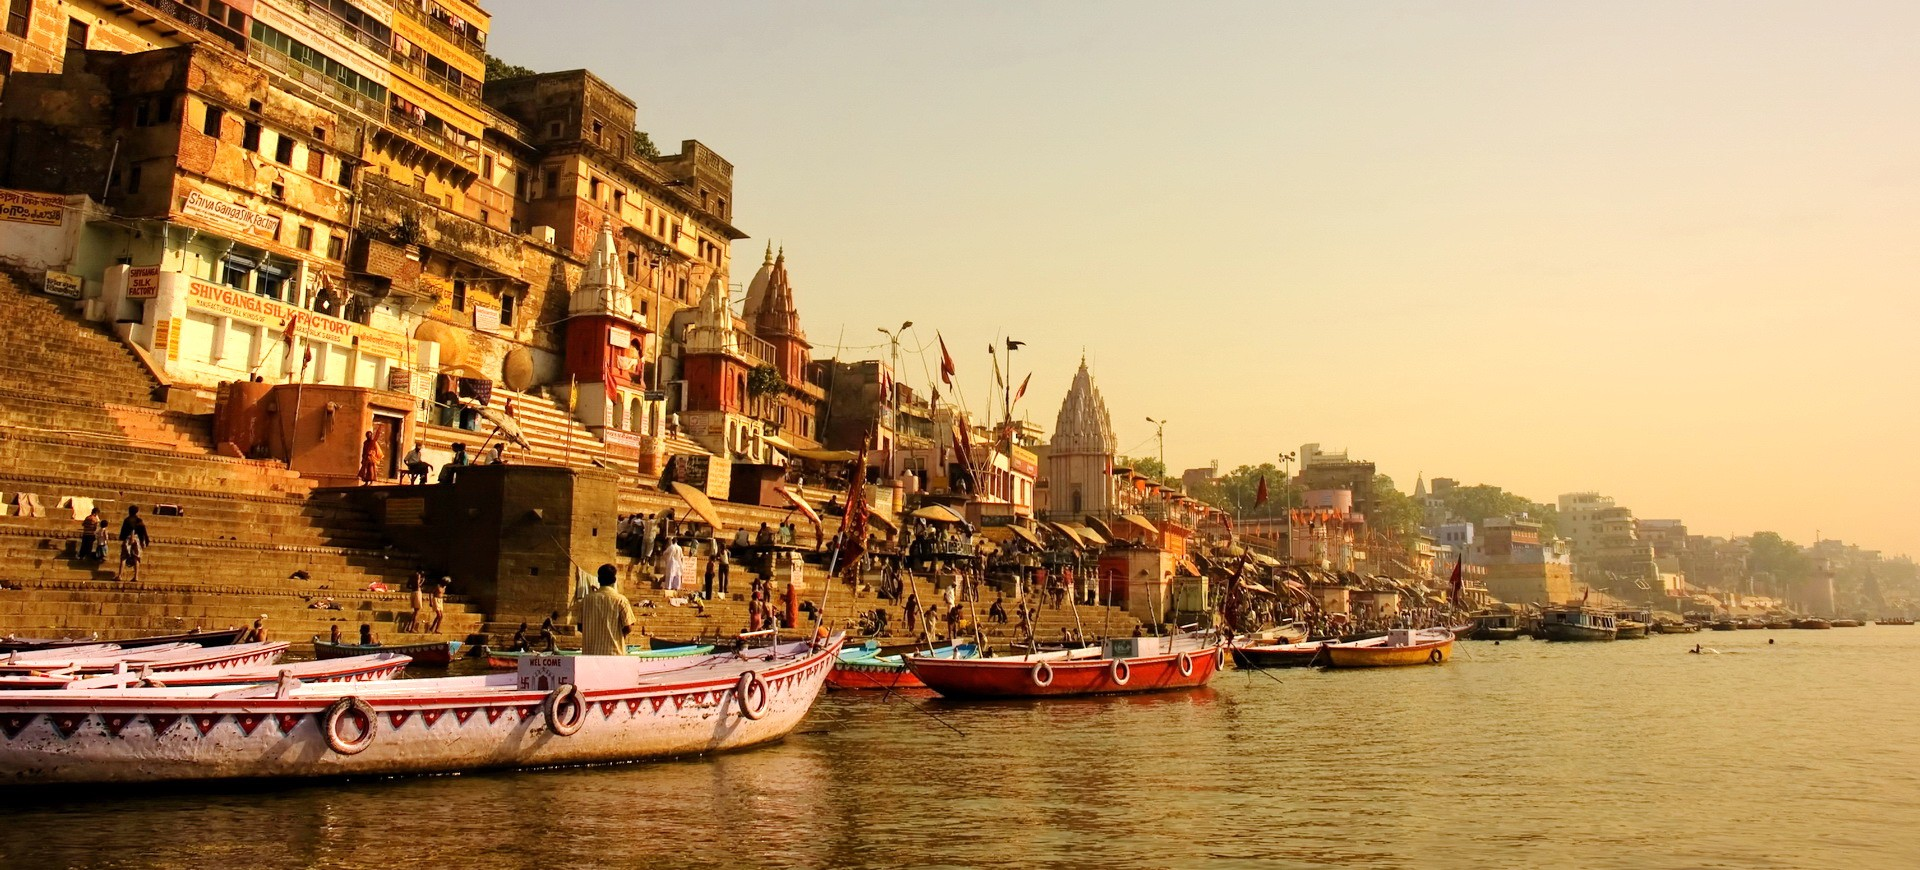 Ganges le fleuve sacré à Varanasi en Inde du nord